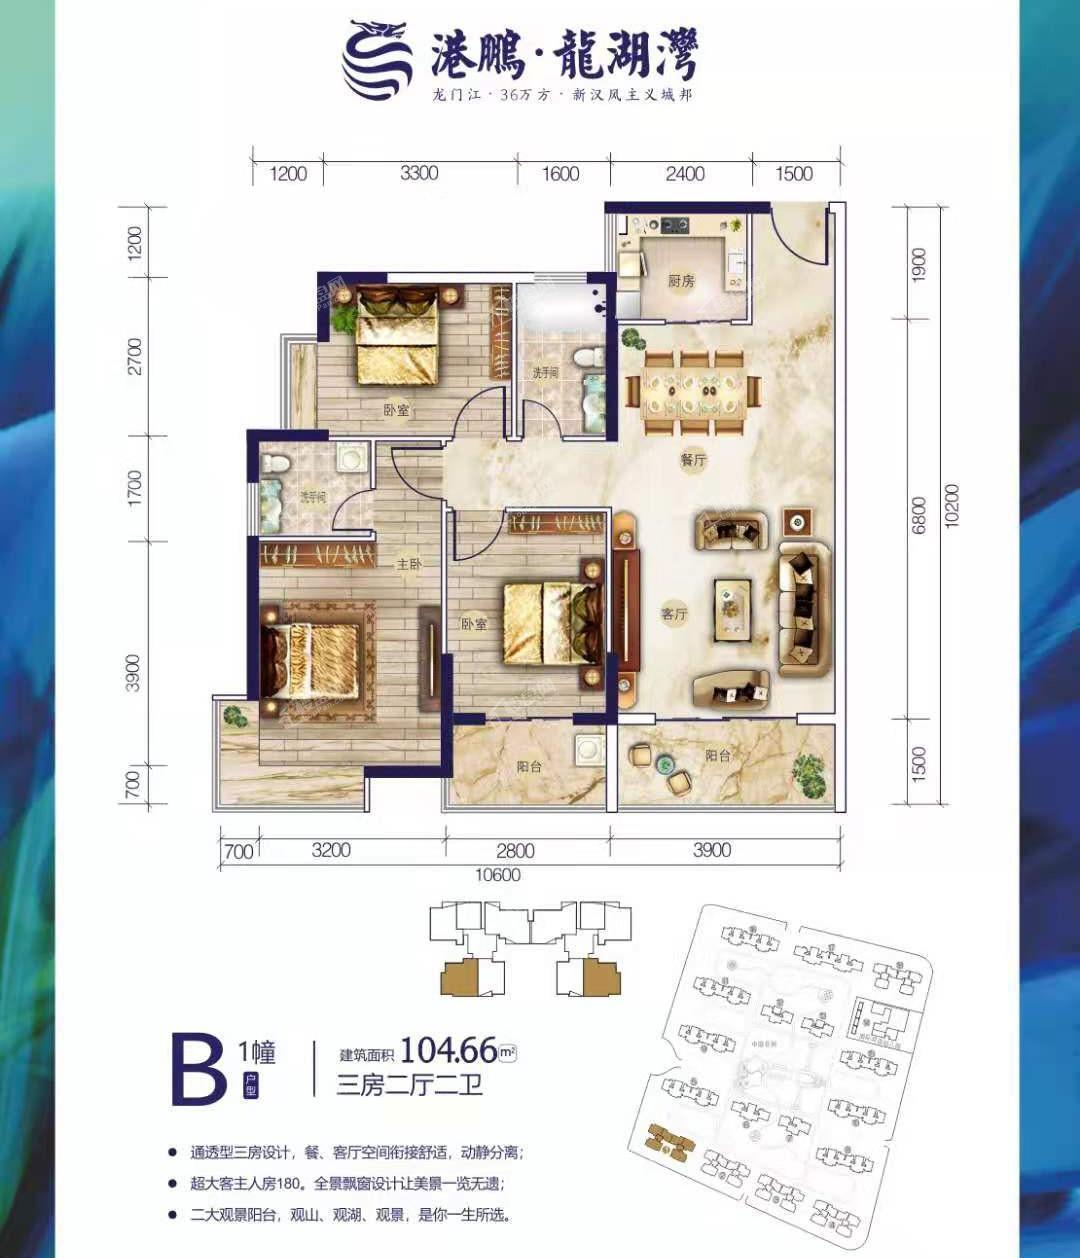 B1幢建面约104.66㎡三房两厅